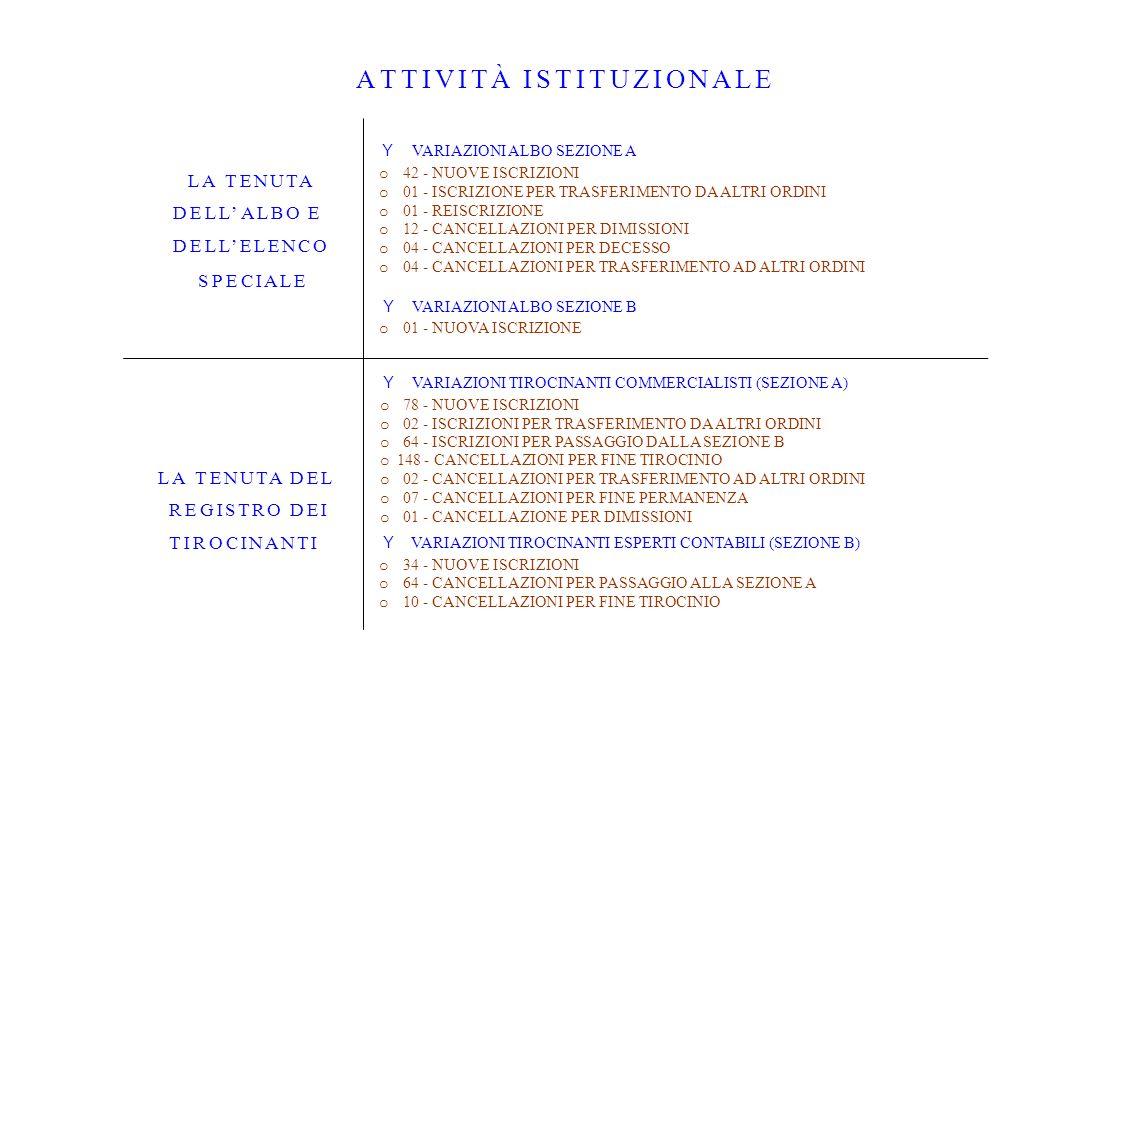 TREND VARIAZIONI AnnoAlbo Unico 2008Albo Unico 2009Albo Unico 2010Albo Unico 2011Albo Unico 2012 Iscrizioni Albo3743544645 Cancellazioni Albo2314183120 Variazioni nette Albo1429361525 Iscrizioni Elenco Speciale30110 Cancellazioni Elenco Speciale05210 Variazioni nette Elenco3-500 Iscritti all Albo al 31/1293296199710121037 Iscritti all Elenco al 31/12181312 1050 1000 950 900 850 Albo UnicoAlbo UnicoAlbo UnicoAlbo Unico 2008200920102011 Albo Unico 2012 TREND ISCRITTI ALL ALBO AL 31 DICEMBRE TREND VARIAZIONI NETTE ISCRITTI ALL ALBO 14 29 36 15 25 0 10 20 30 40 Albo Unico 2008Albo Unico 2009Albo Unico 2010Albo Unico 2011Albo Unico 2012